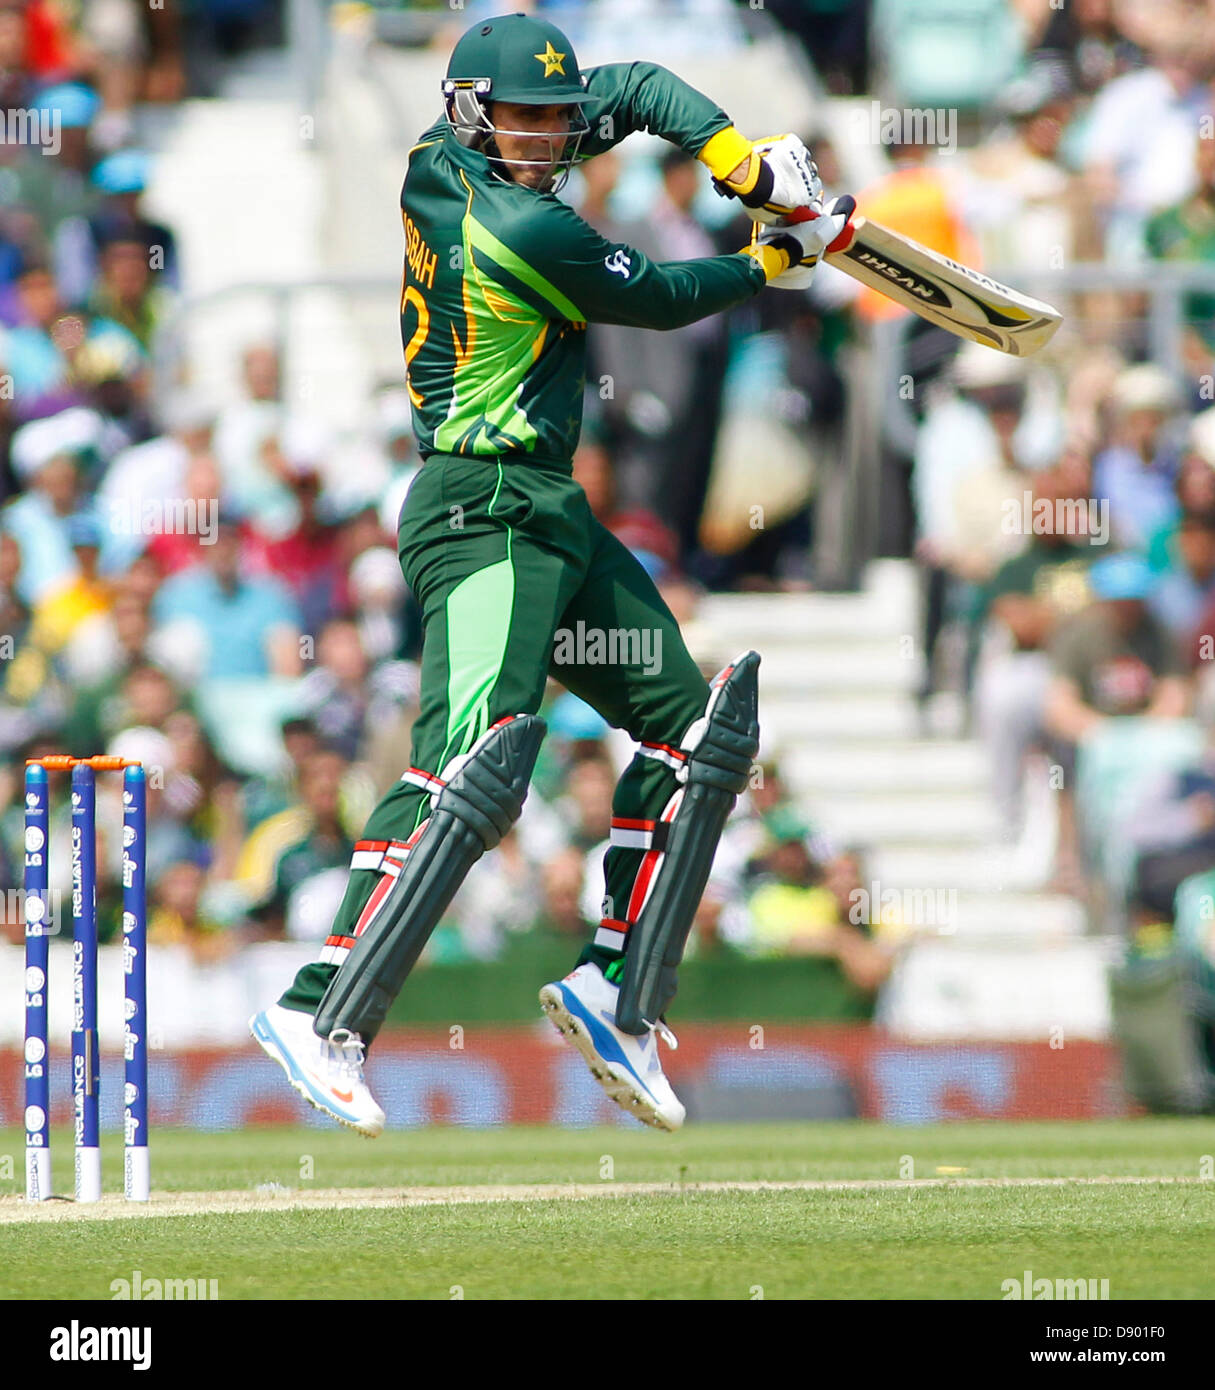 7th June 2013 Pakistans Misbah Ul Haq Batting During